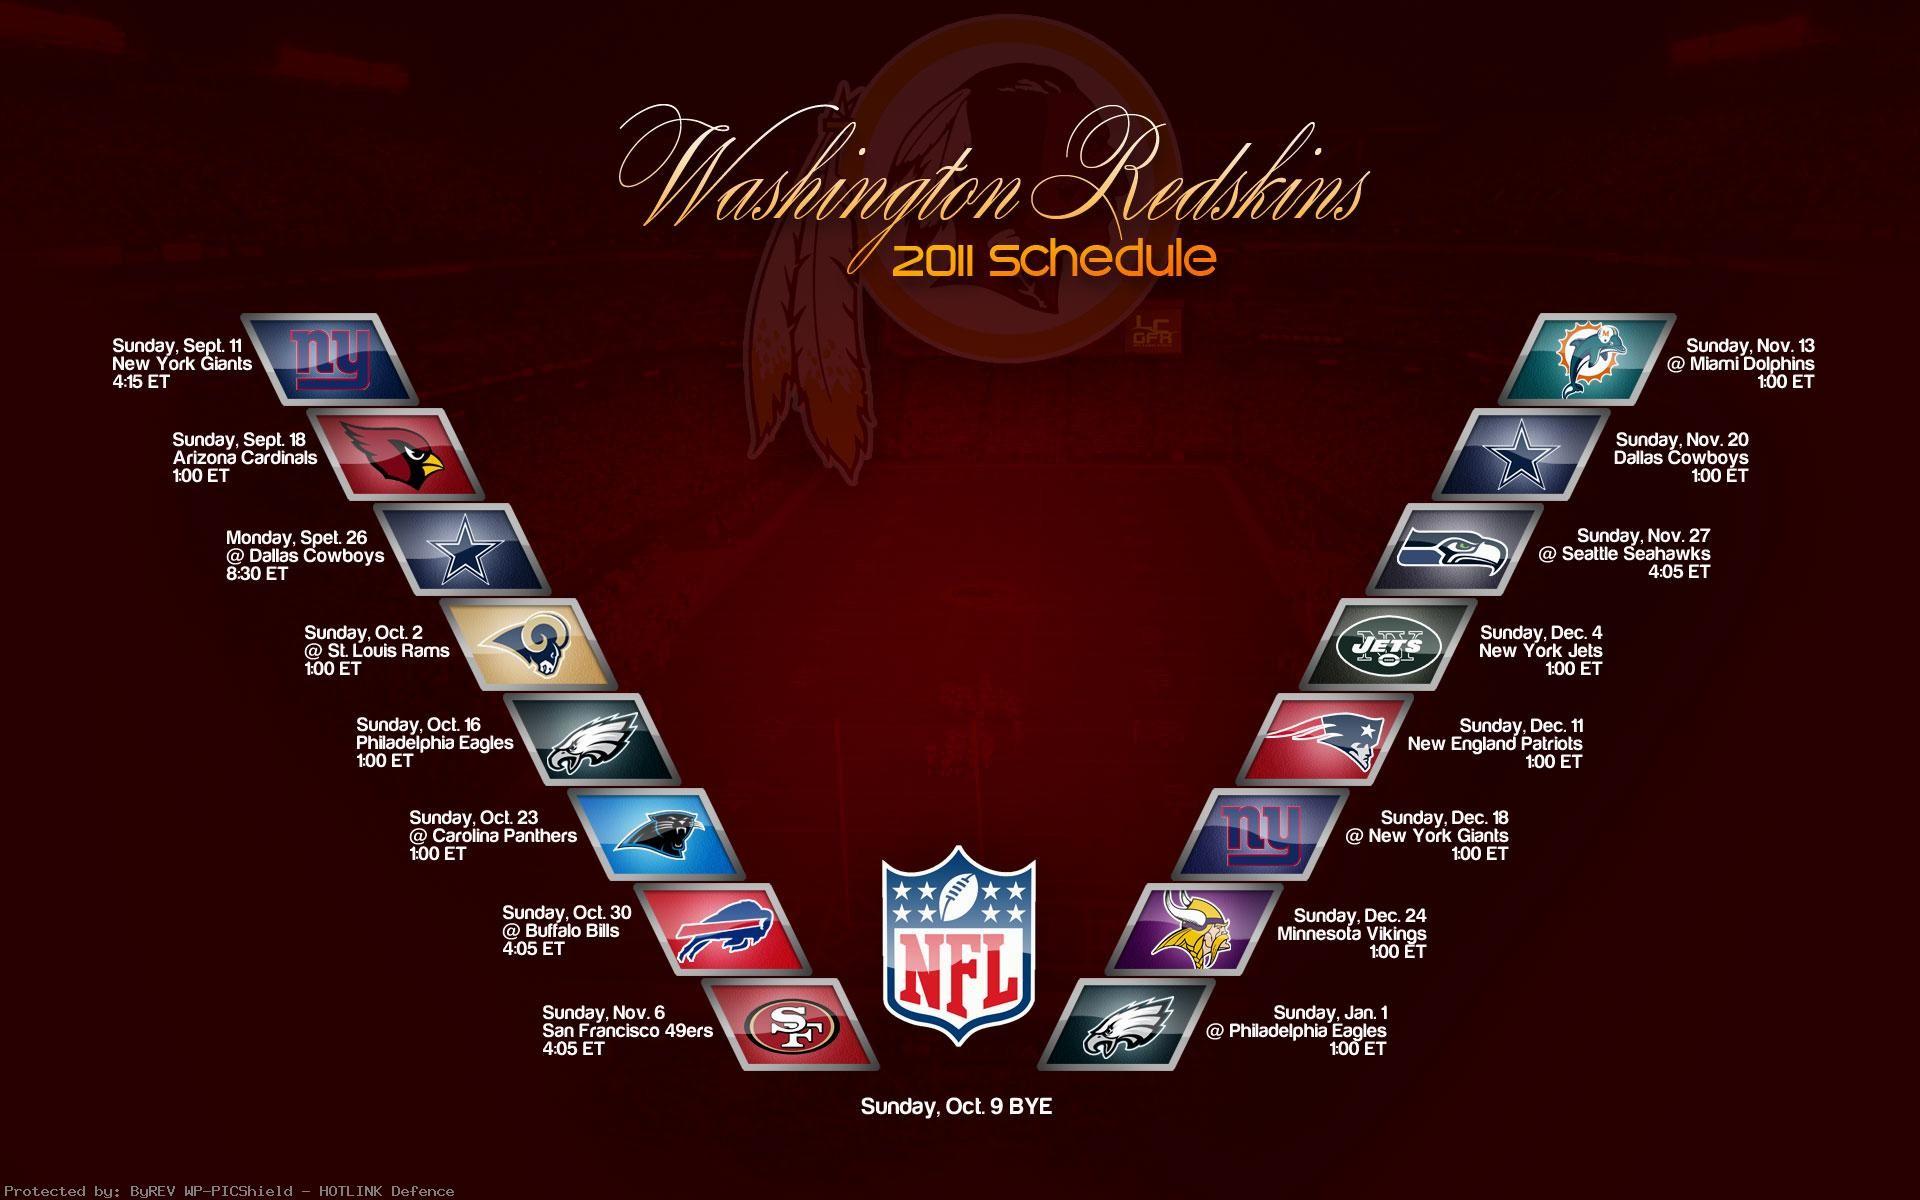 68+ Washington Redskins HD